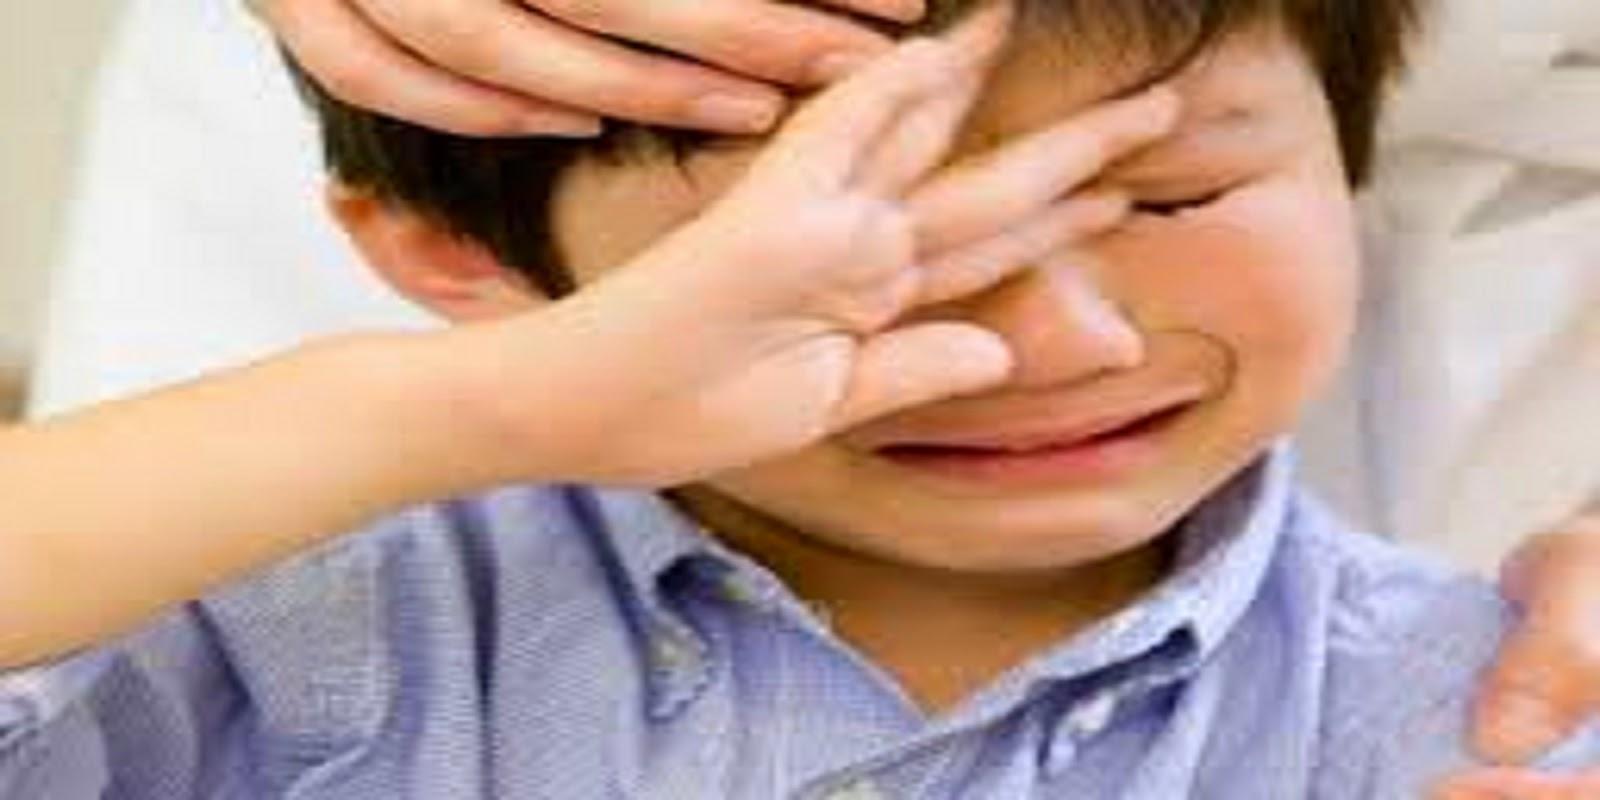 Niño Asustado Gritando: DIARIO DE UN CORREDOR DE FONDO